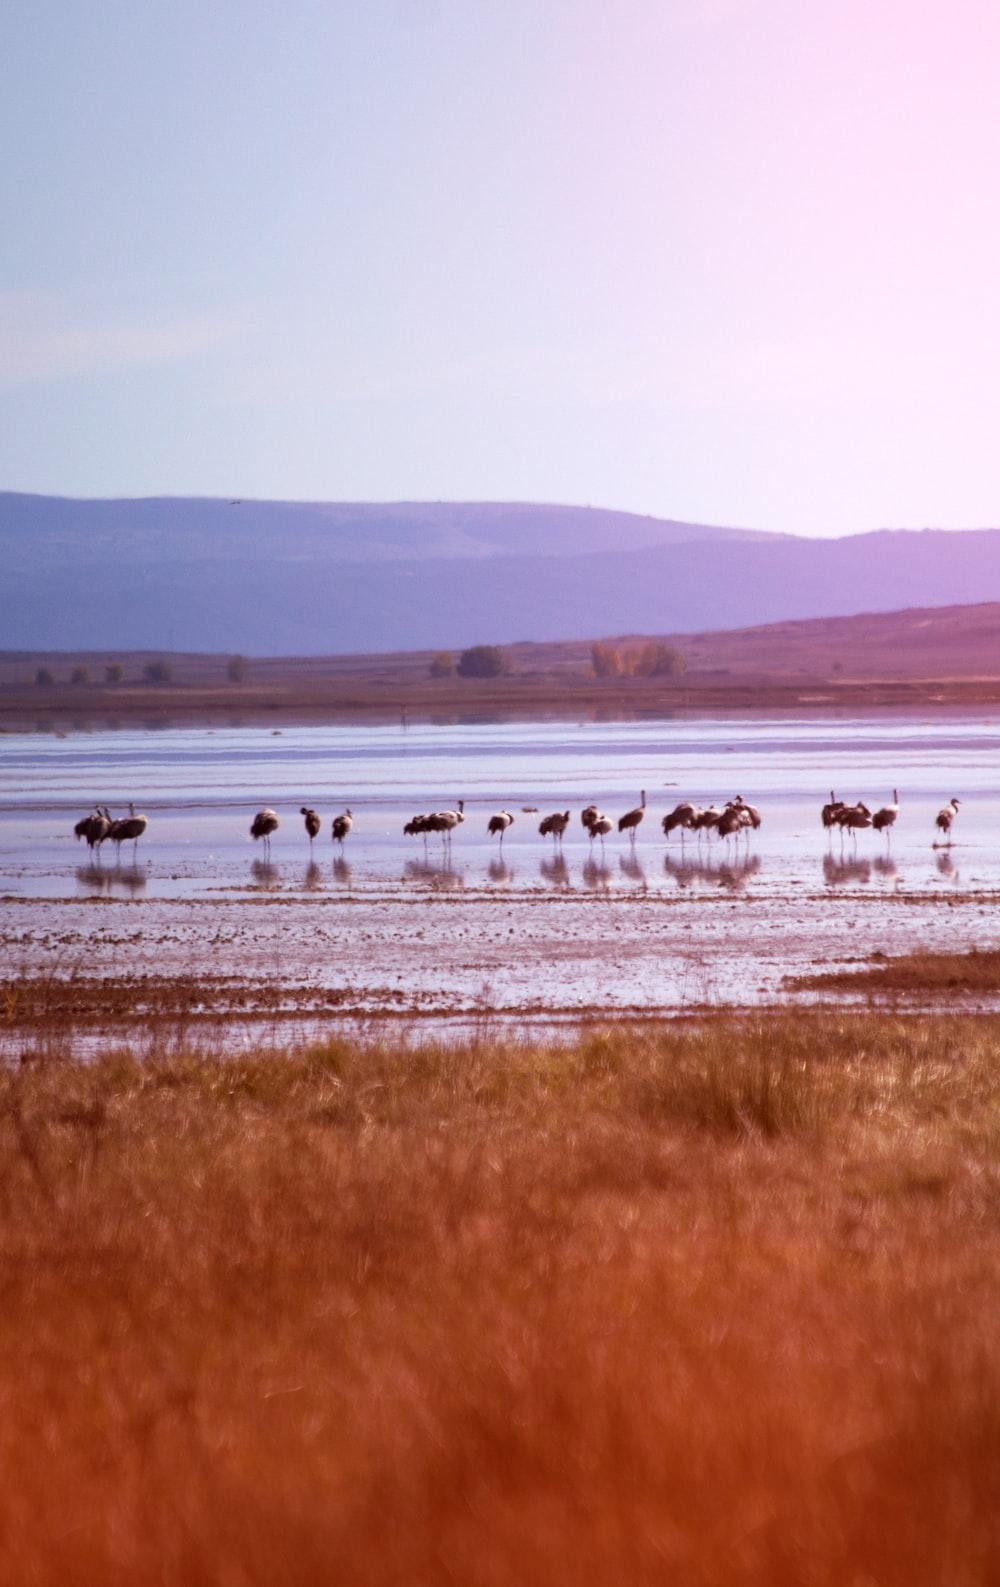 flamingo bird on body of water